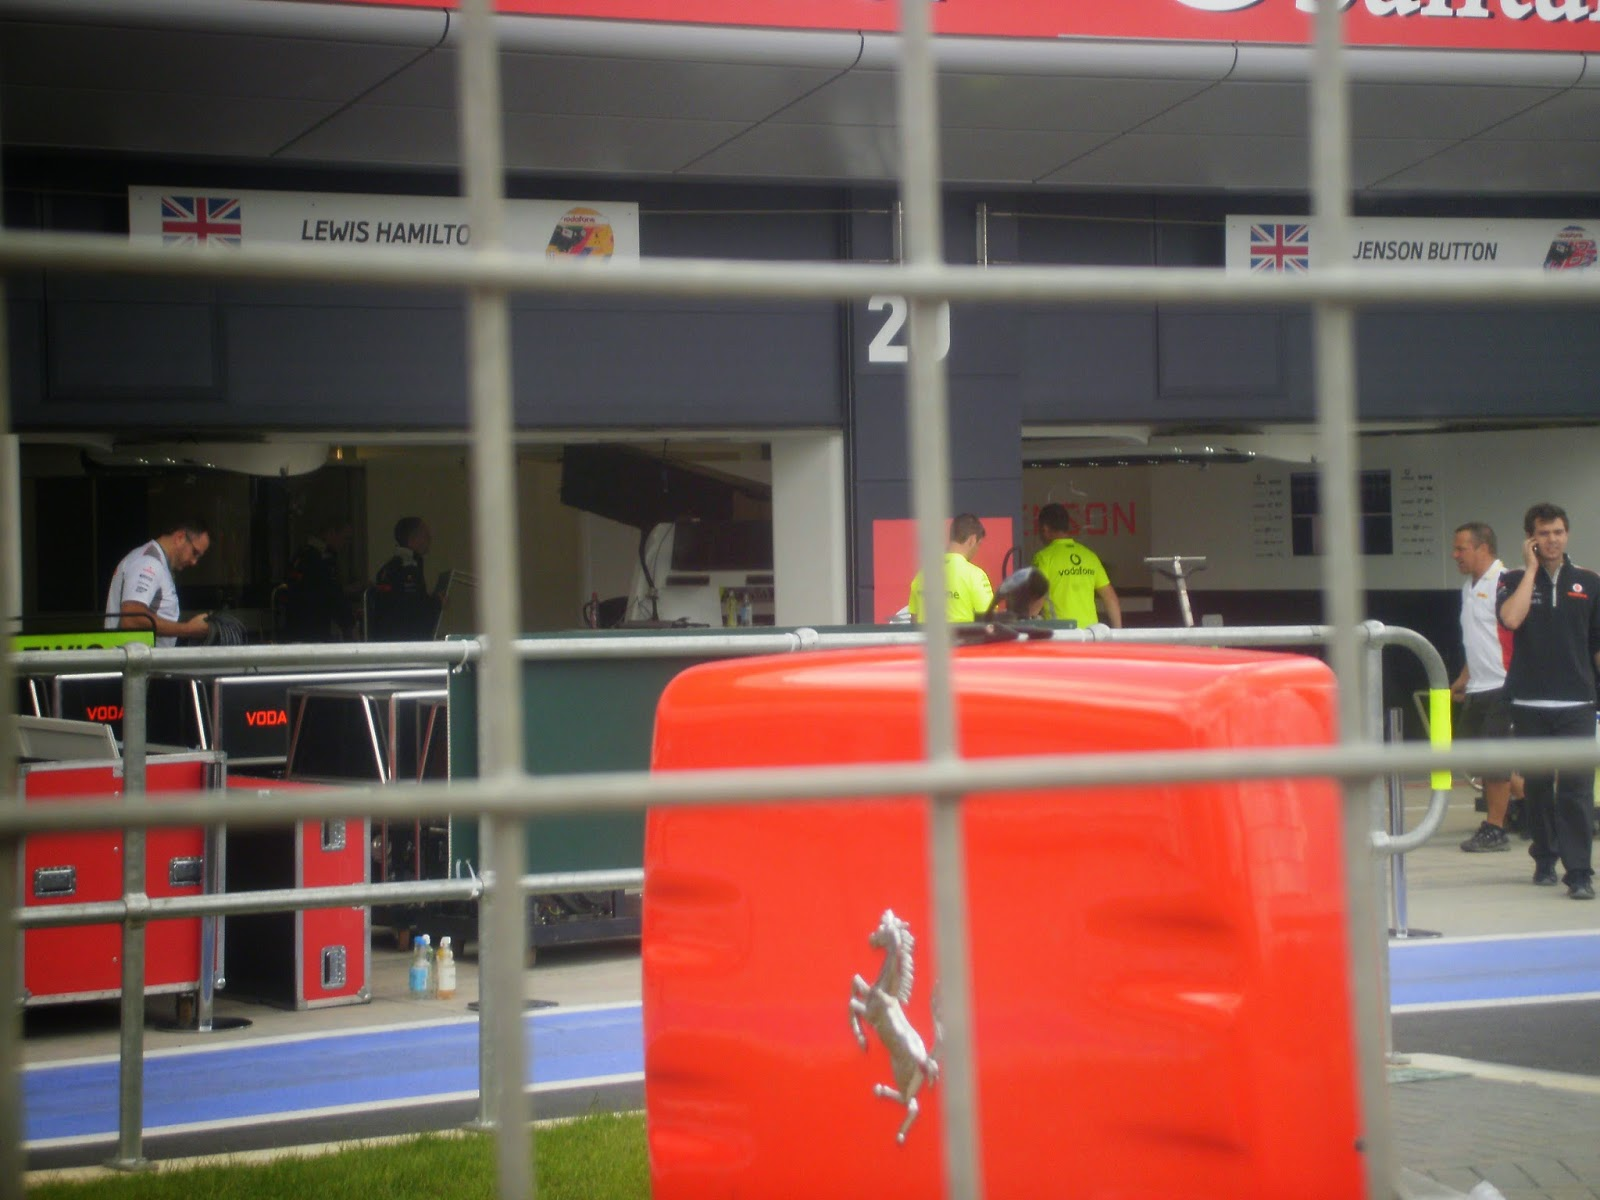 Silverstone Grand Prix F1 2012 McLaran garage Lewis Hamilton Jenson Button Melbourne Australian 2015